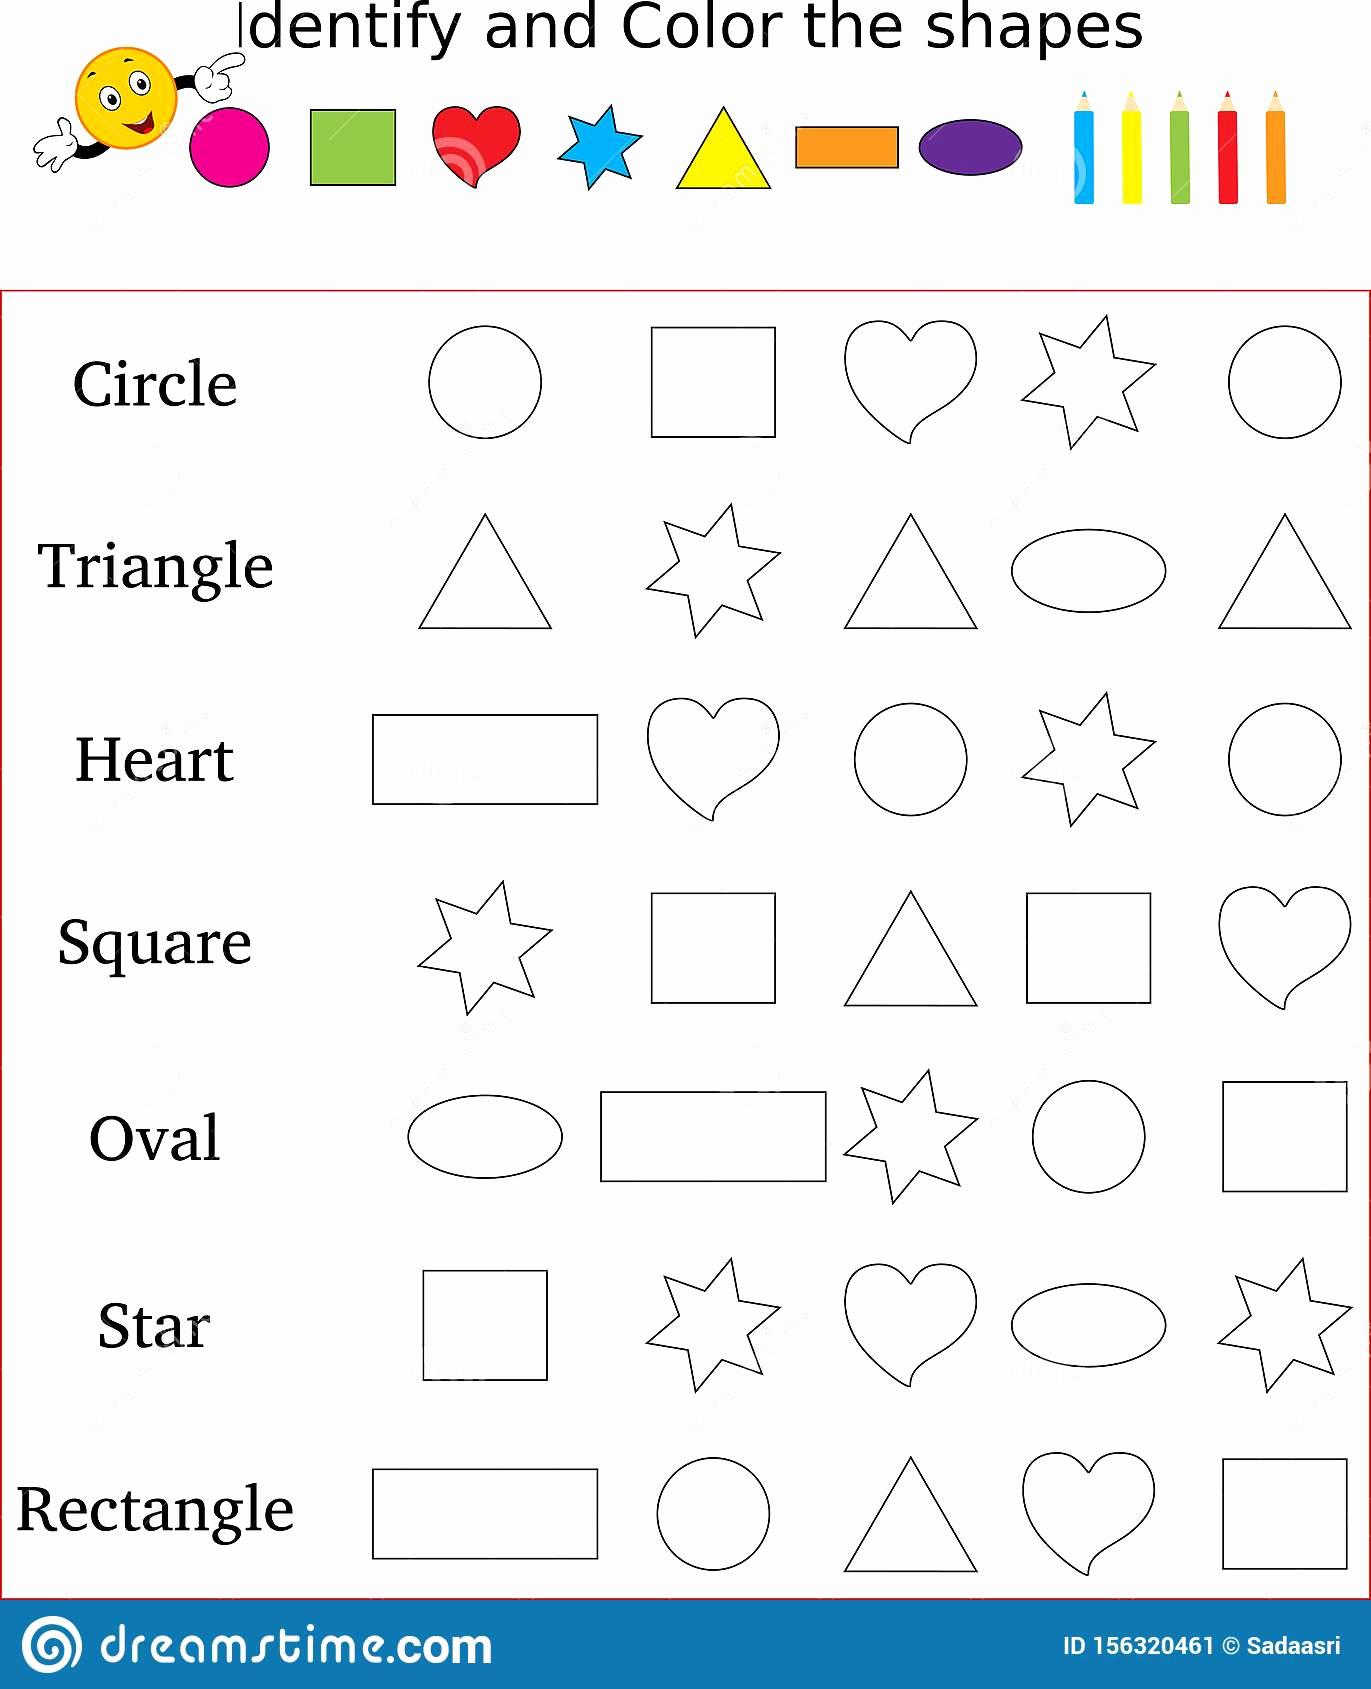 Identify Shapes Worksheet Kindergarten Lovely Worksheet Identify & Count Basic Shapes Cartoon Vector